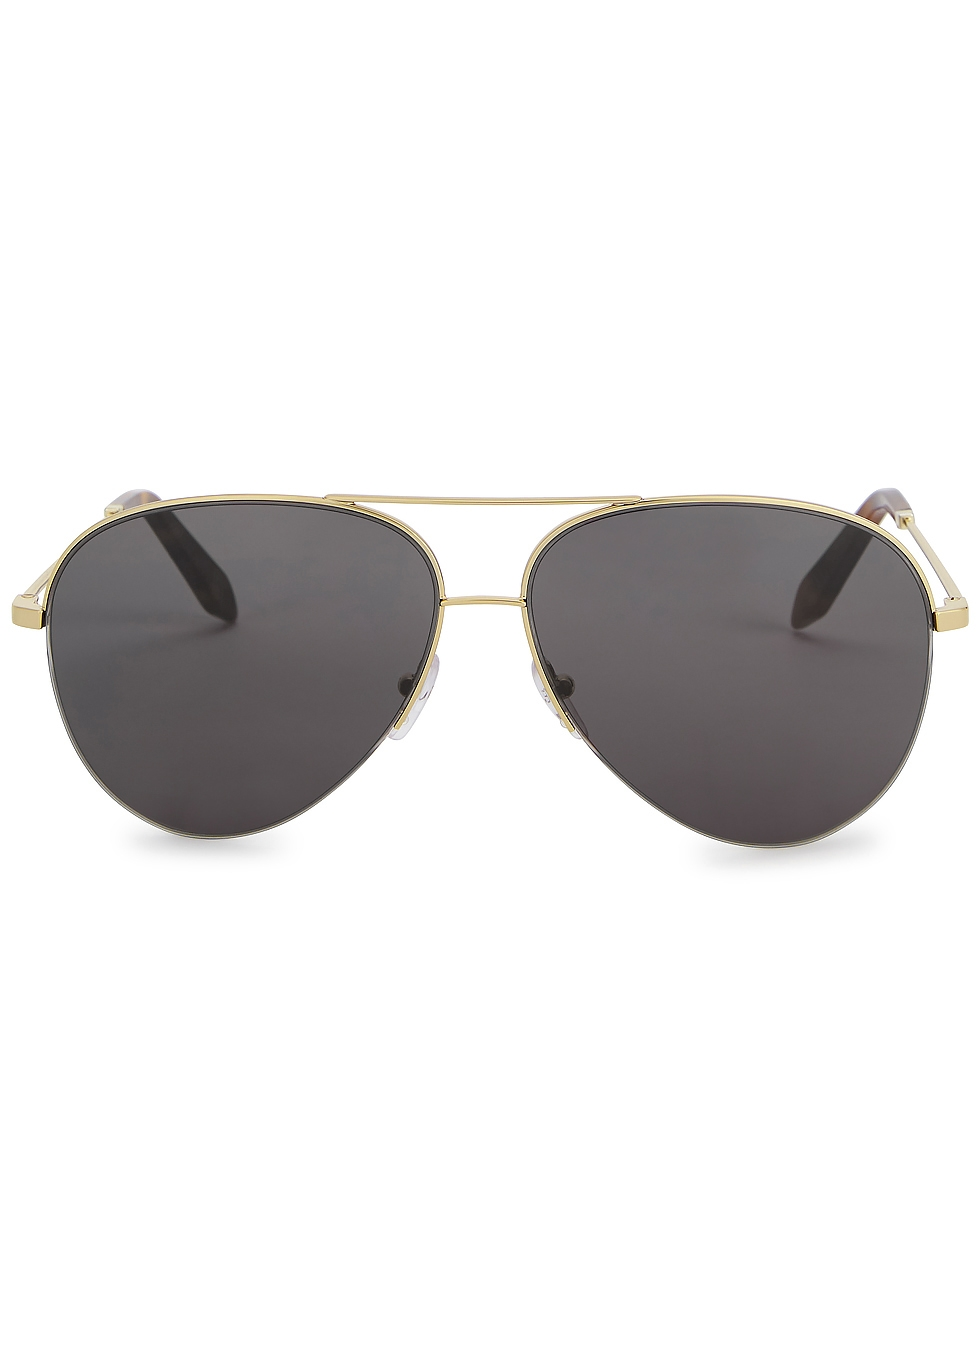 Classic Victoria aviator-style sunglasses - Victoria Beckham